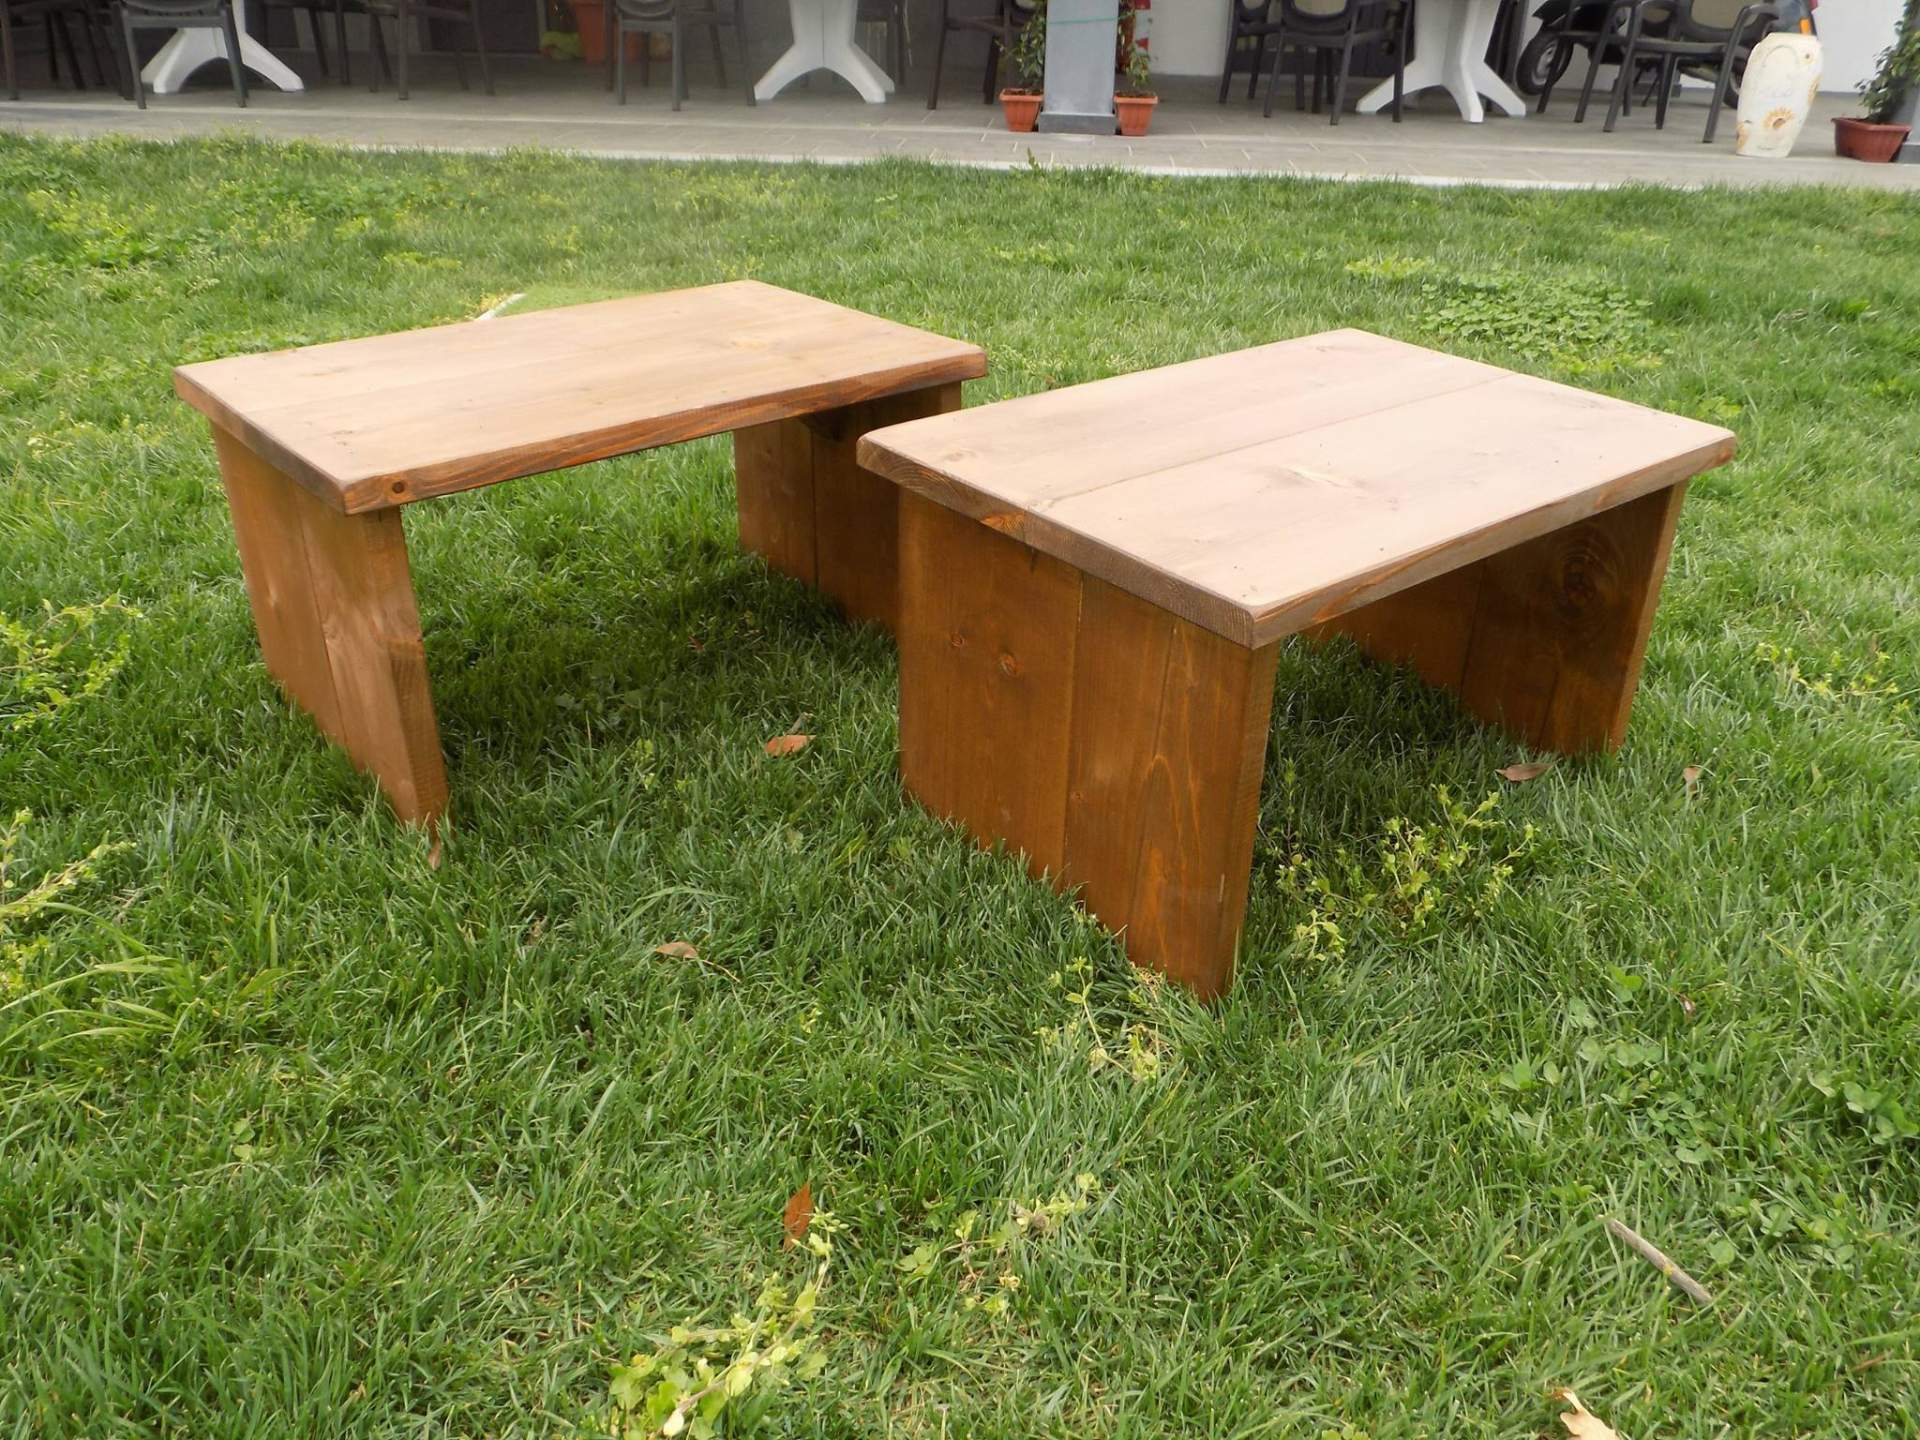 Noleggio tavoli per eventi feste e cerimonie - Noleggio tavoli e sedie per feste catania ...